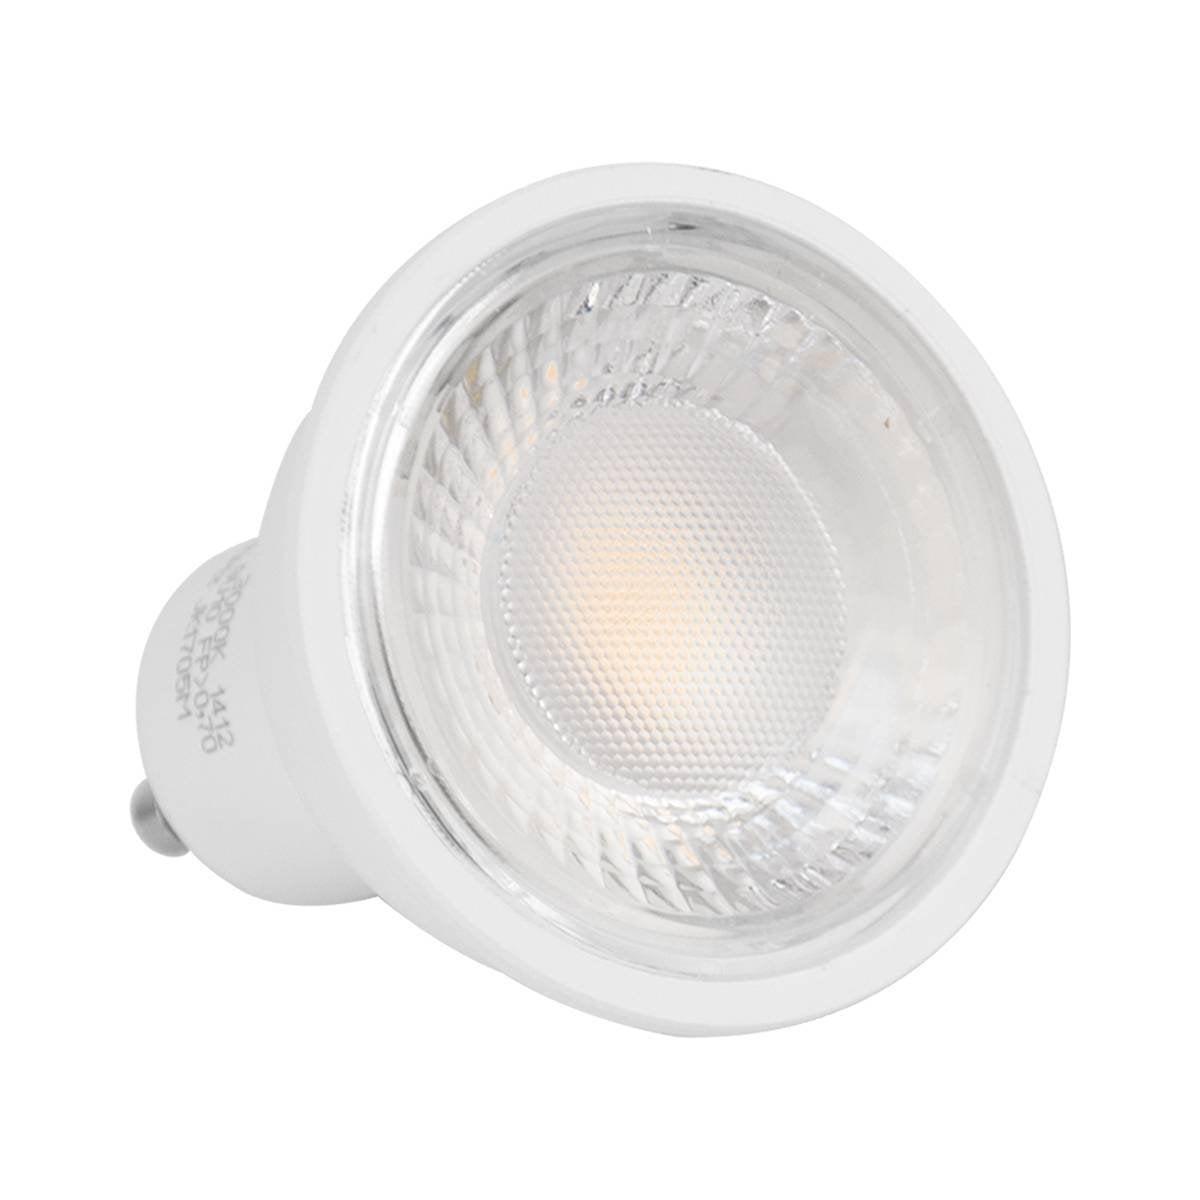 LAMPADA DICROICA LED 3,5W BIVOLT BRANCO QUENTE 3000K JNG